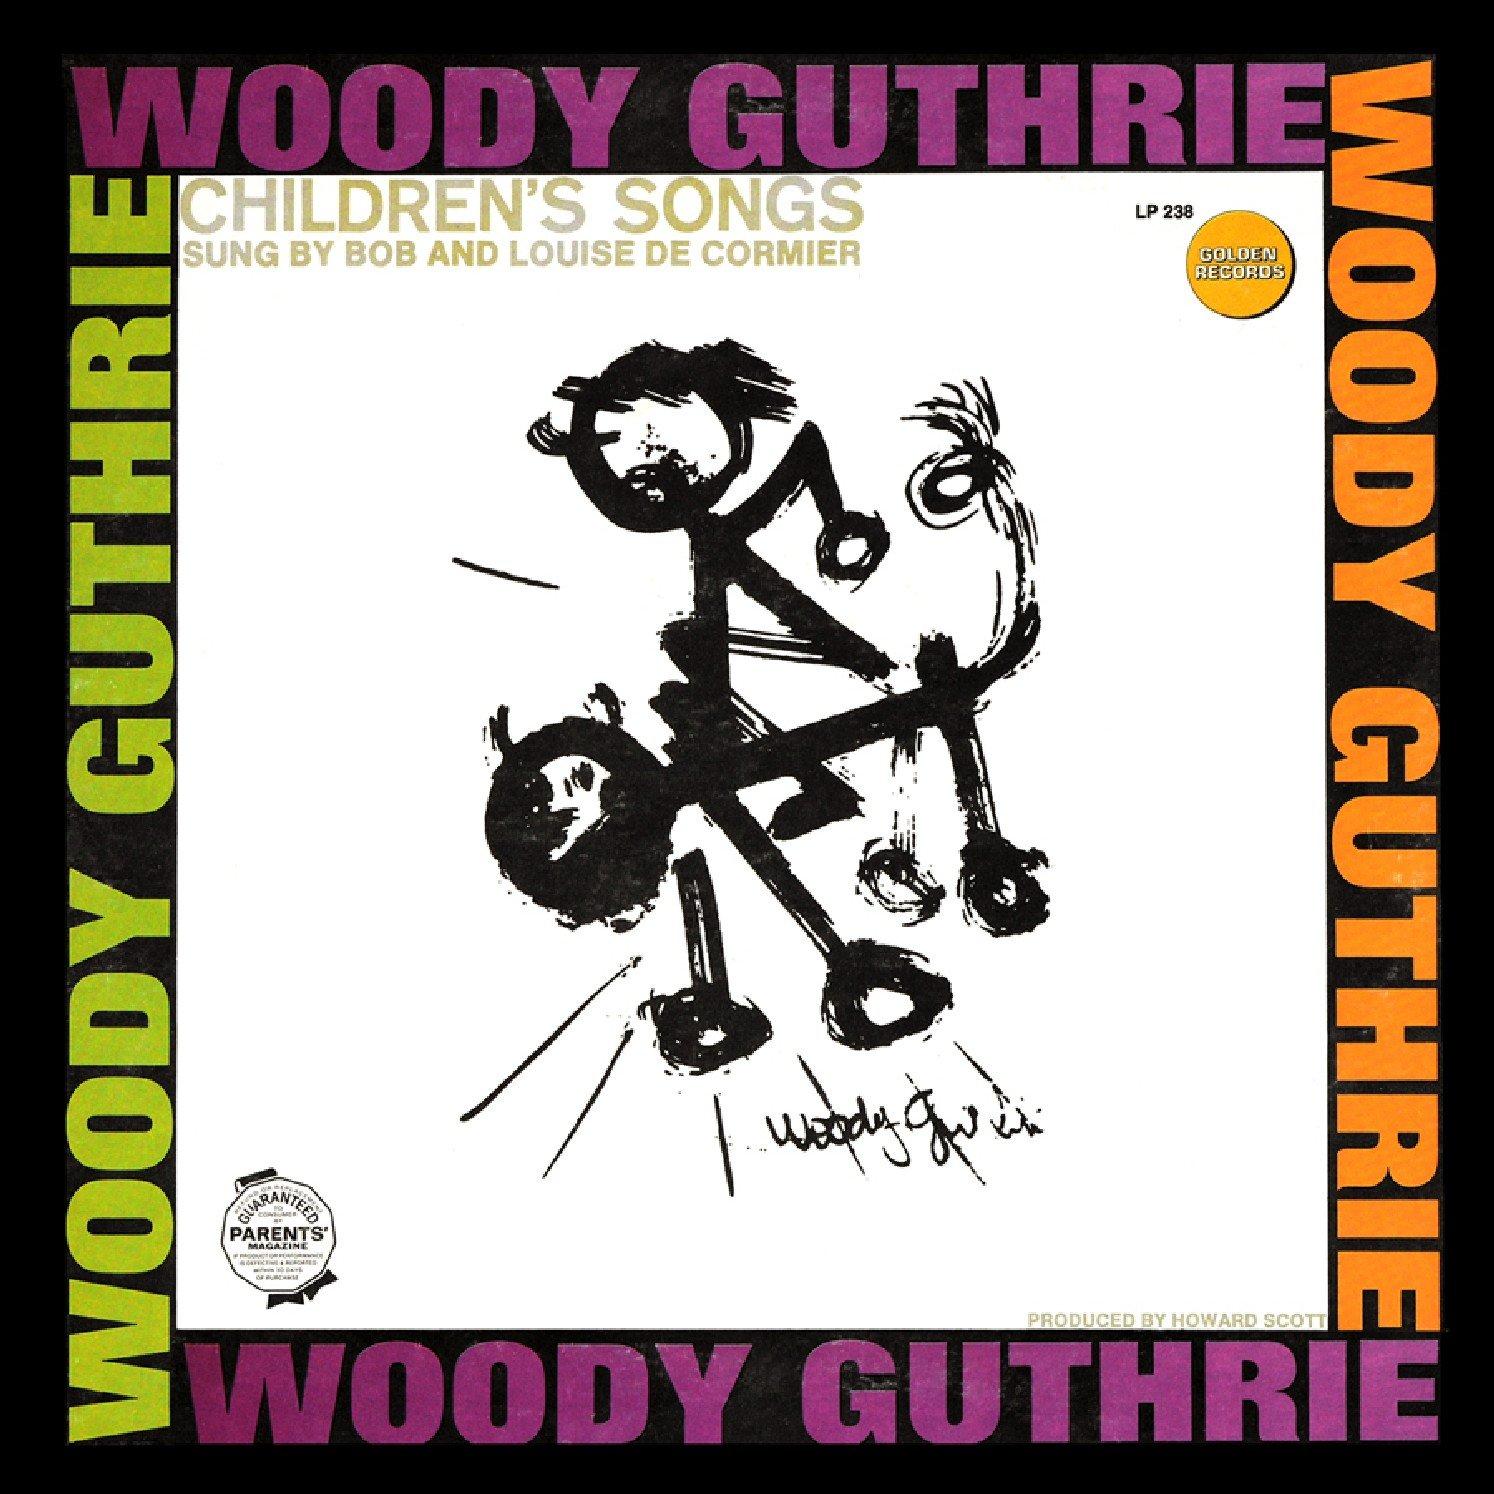 Woody Guthrie Children's Songs                                                                                                                                                                                                                                                    <span class=